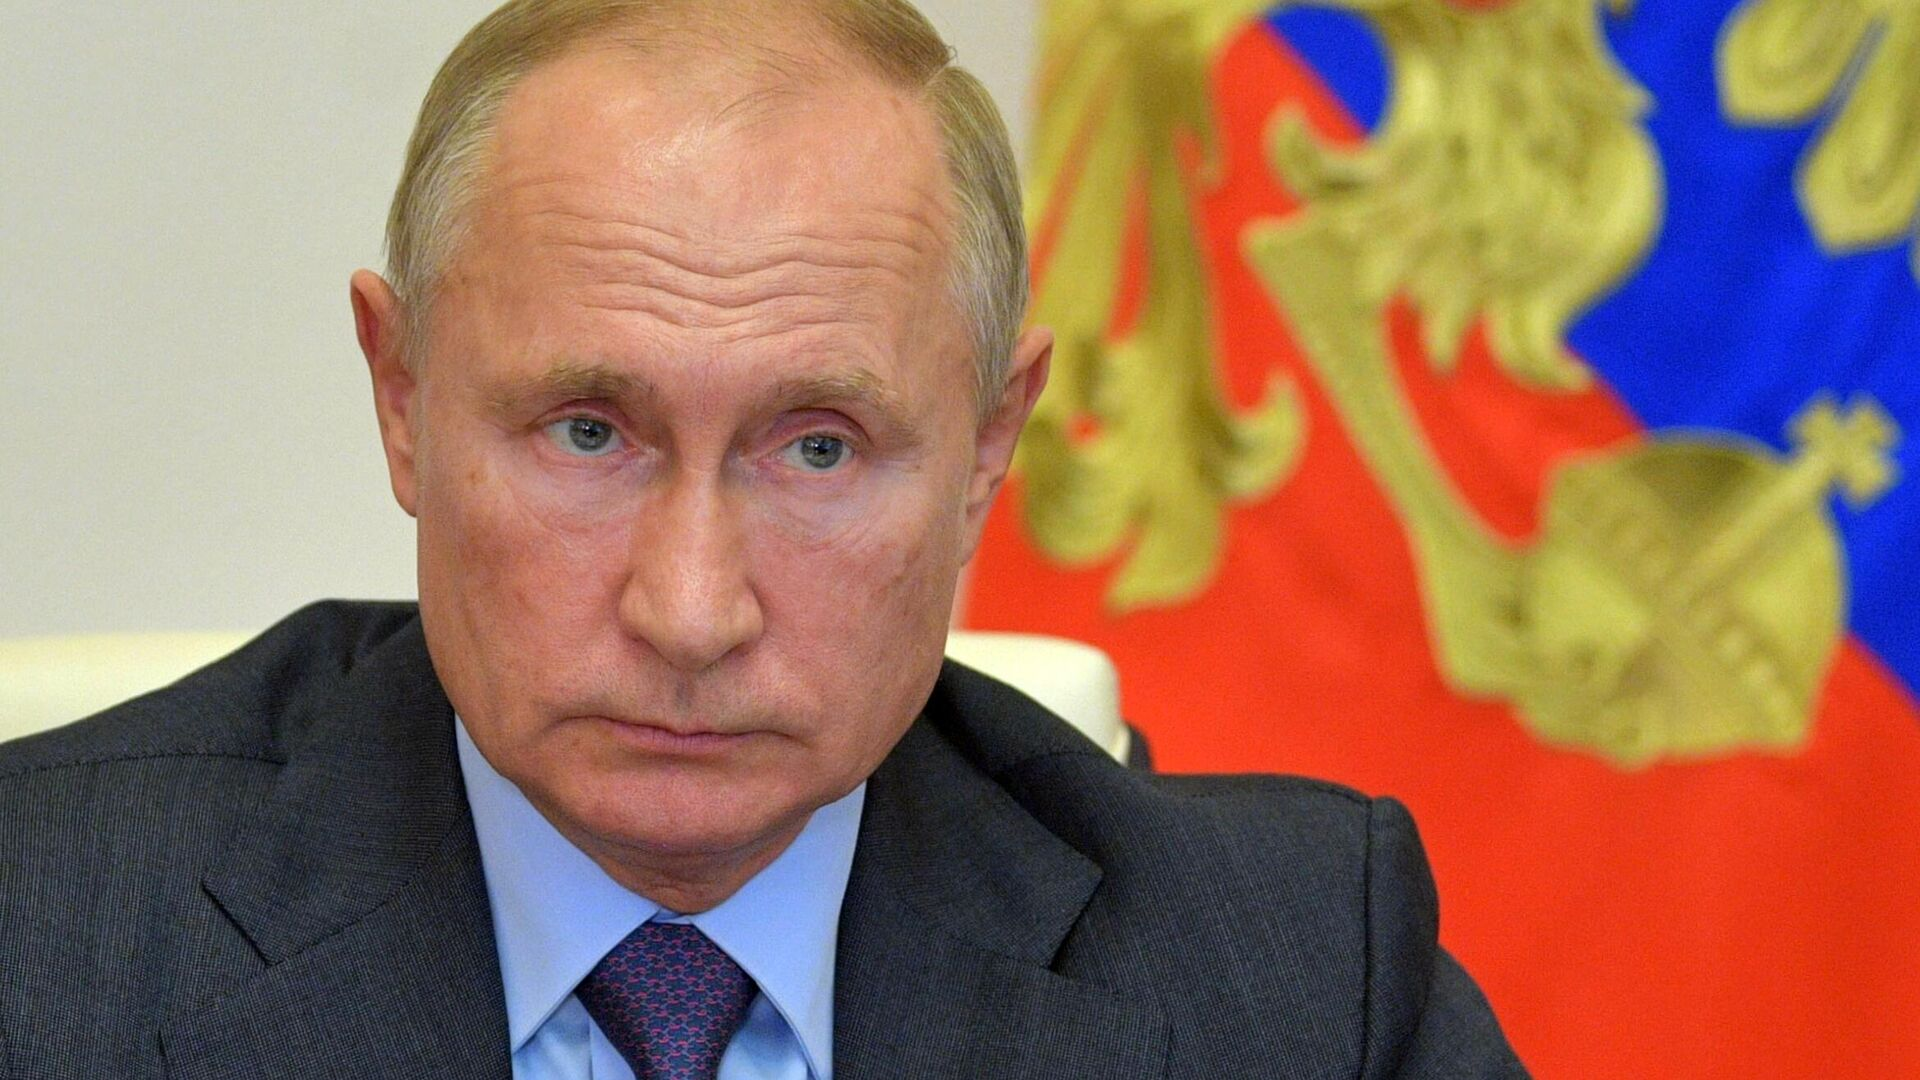 1577981907 0:142:2341:1459 1920x0 80 0 0 7b52a9ed6c7518fe9868705050c8ecfd - Путин подписал закон о бюджете муниципального округа